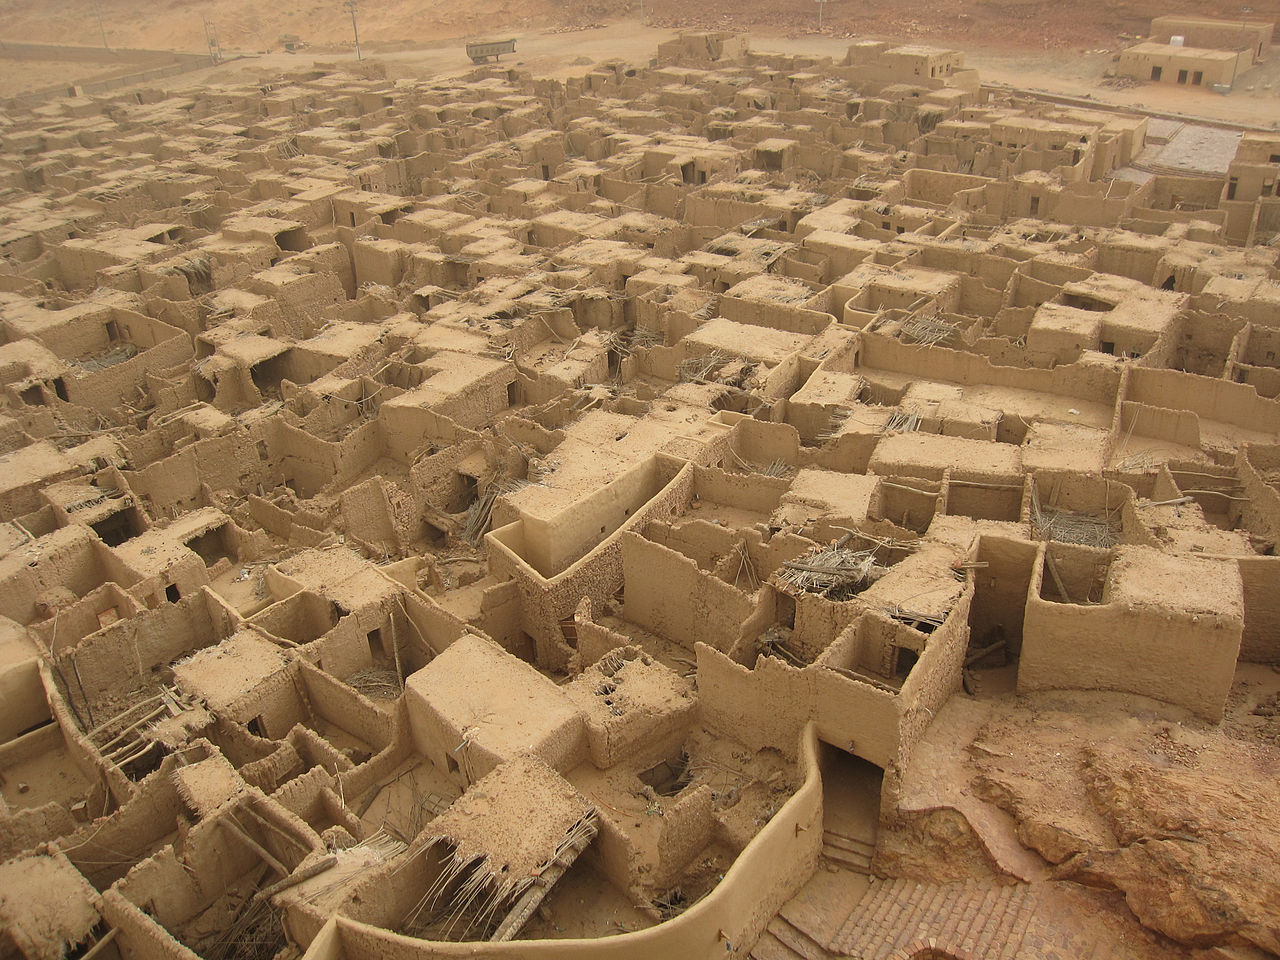 Al-'Ula old town